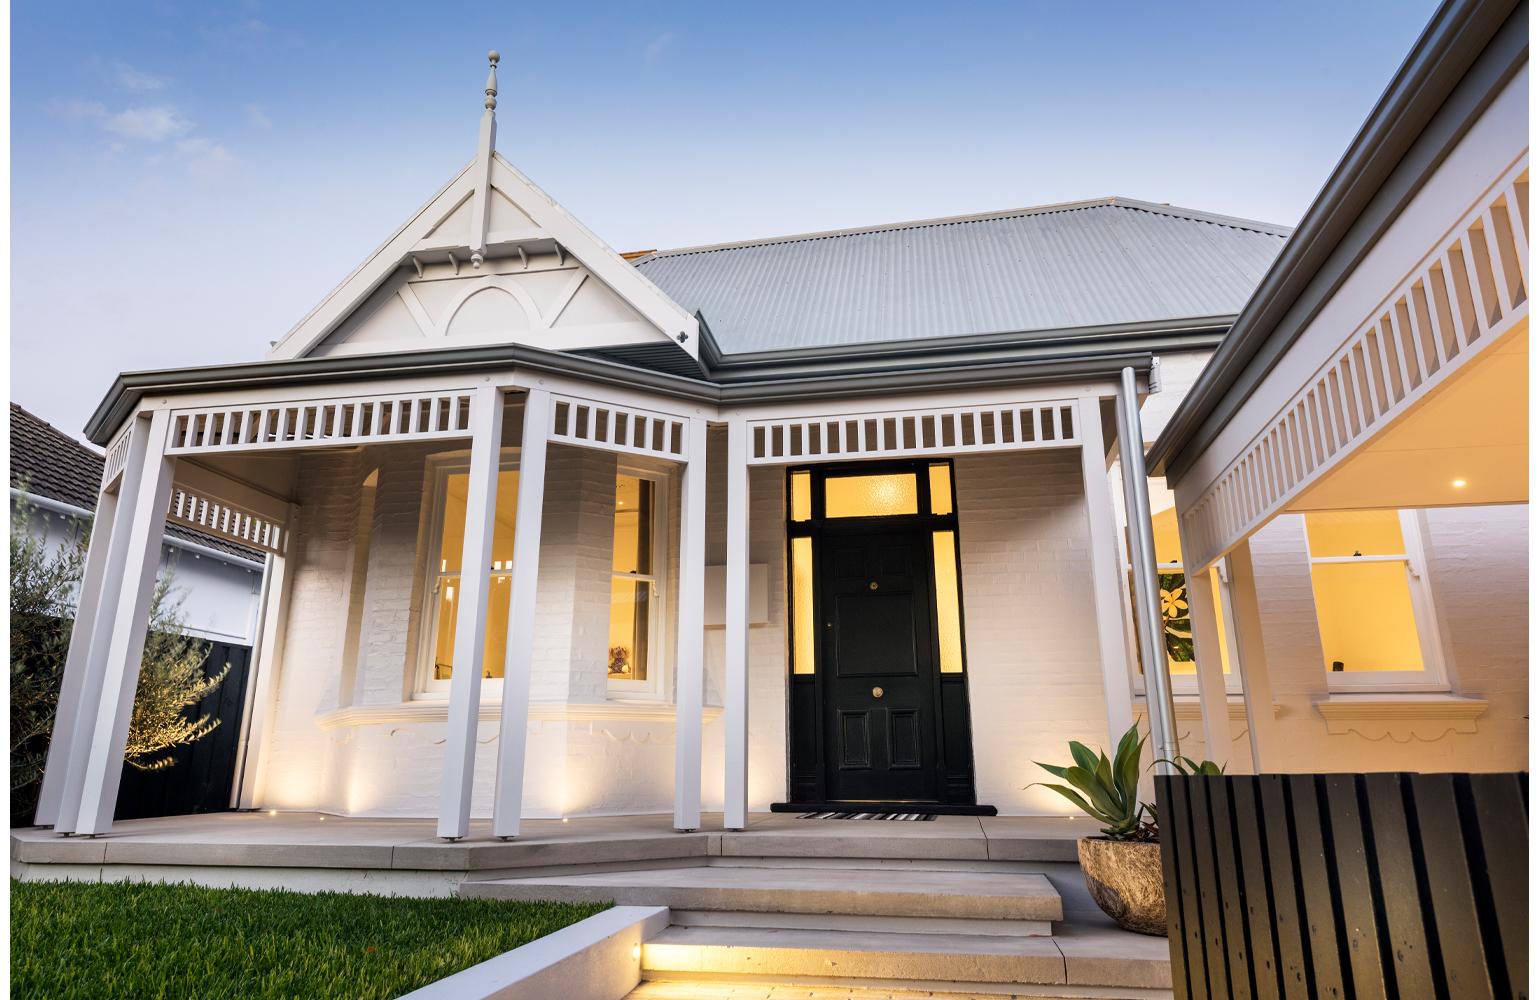 maek-luxury-home-design-inspiration-mosmanpark-27m-gallery-1.jpg